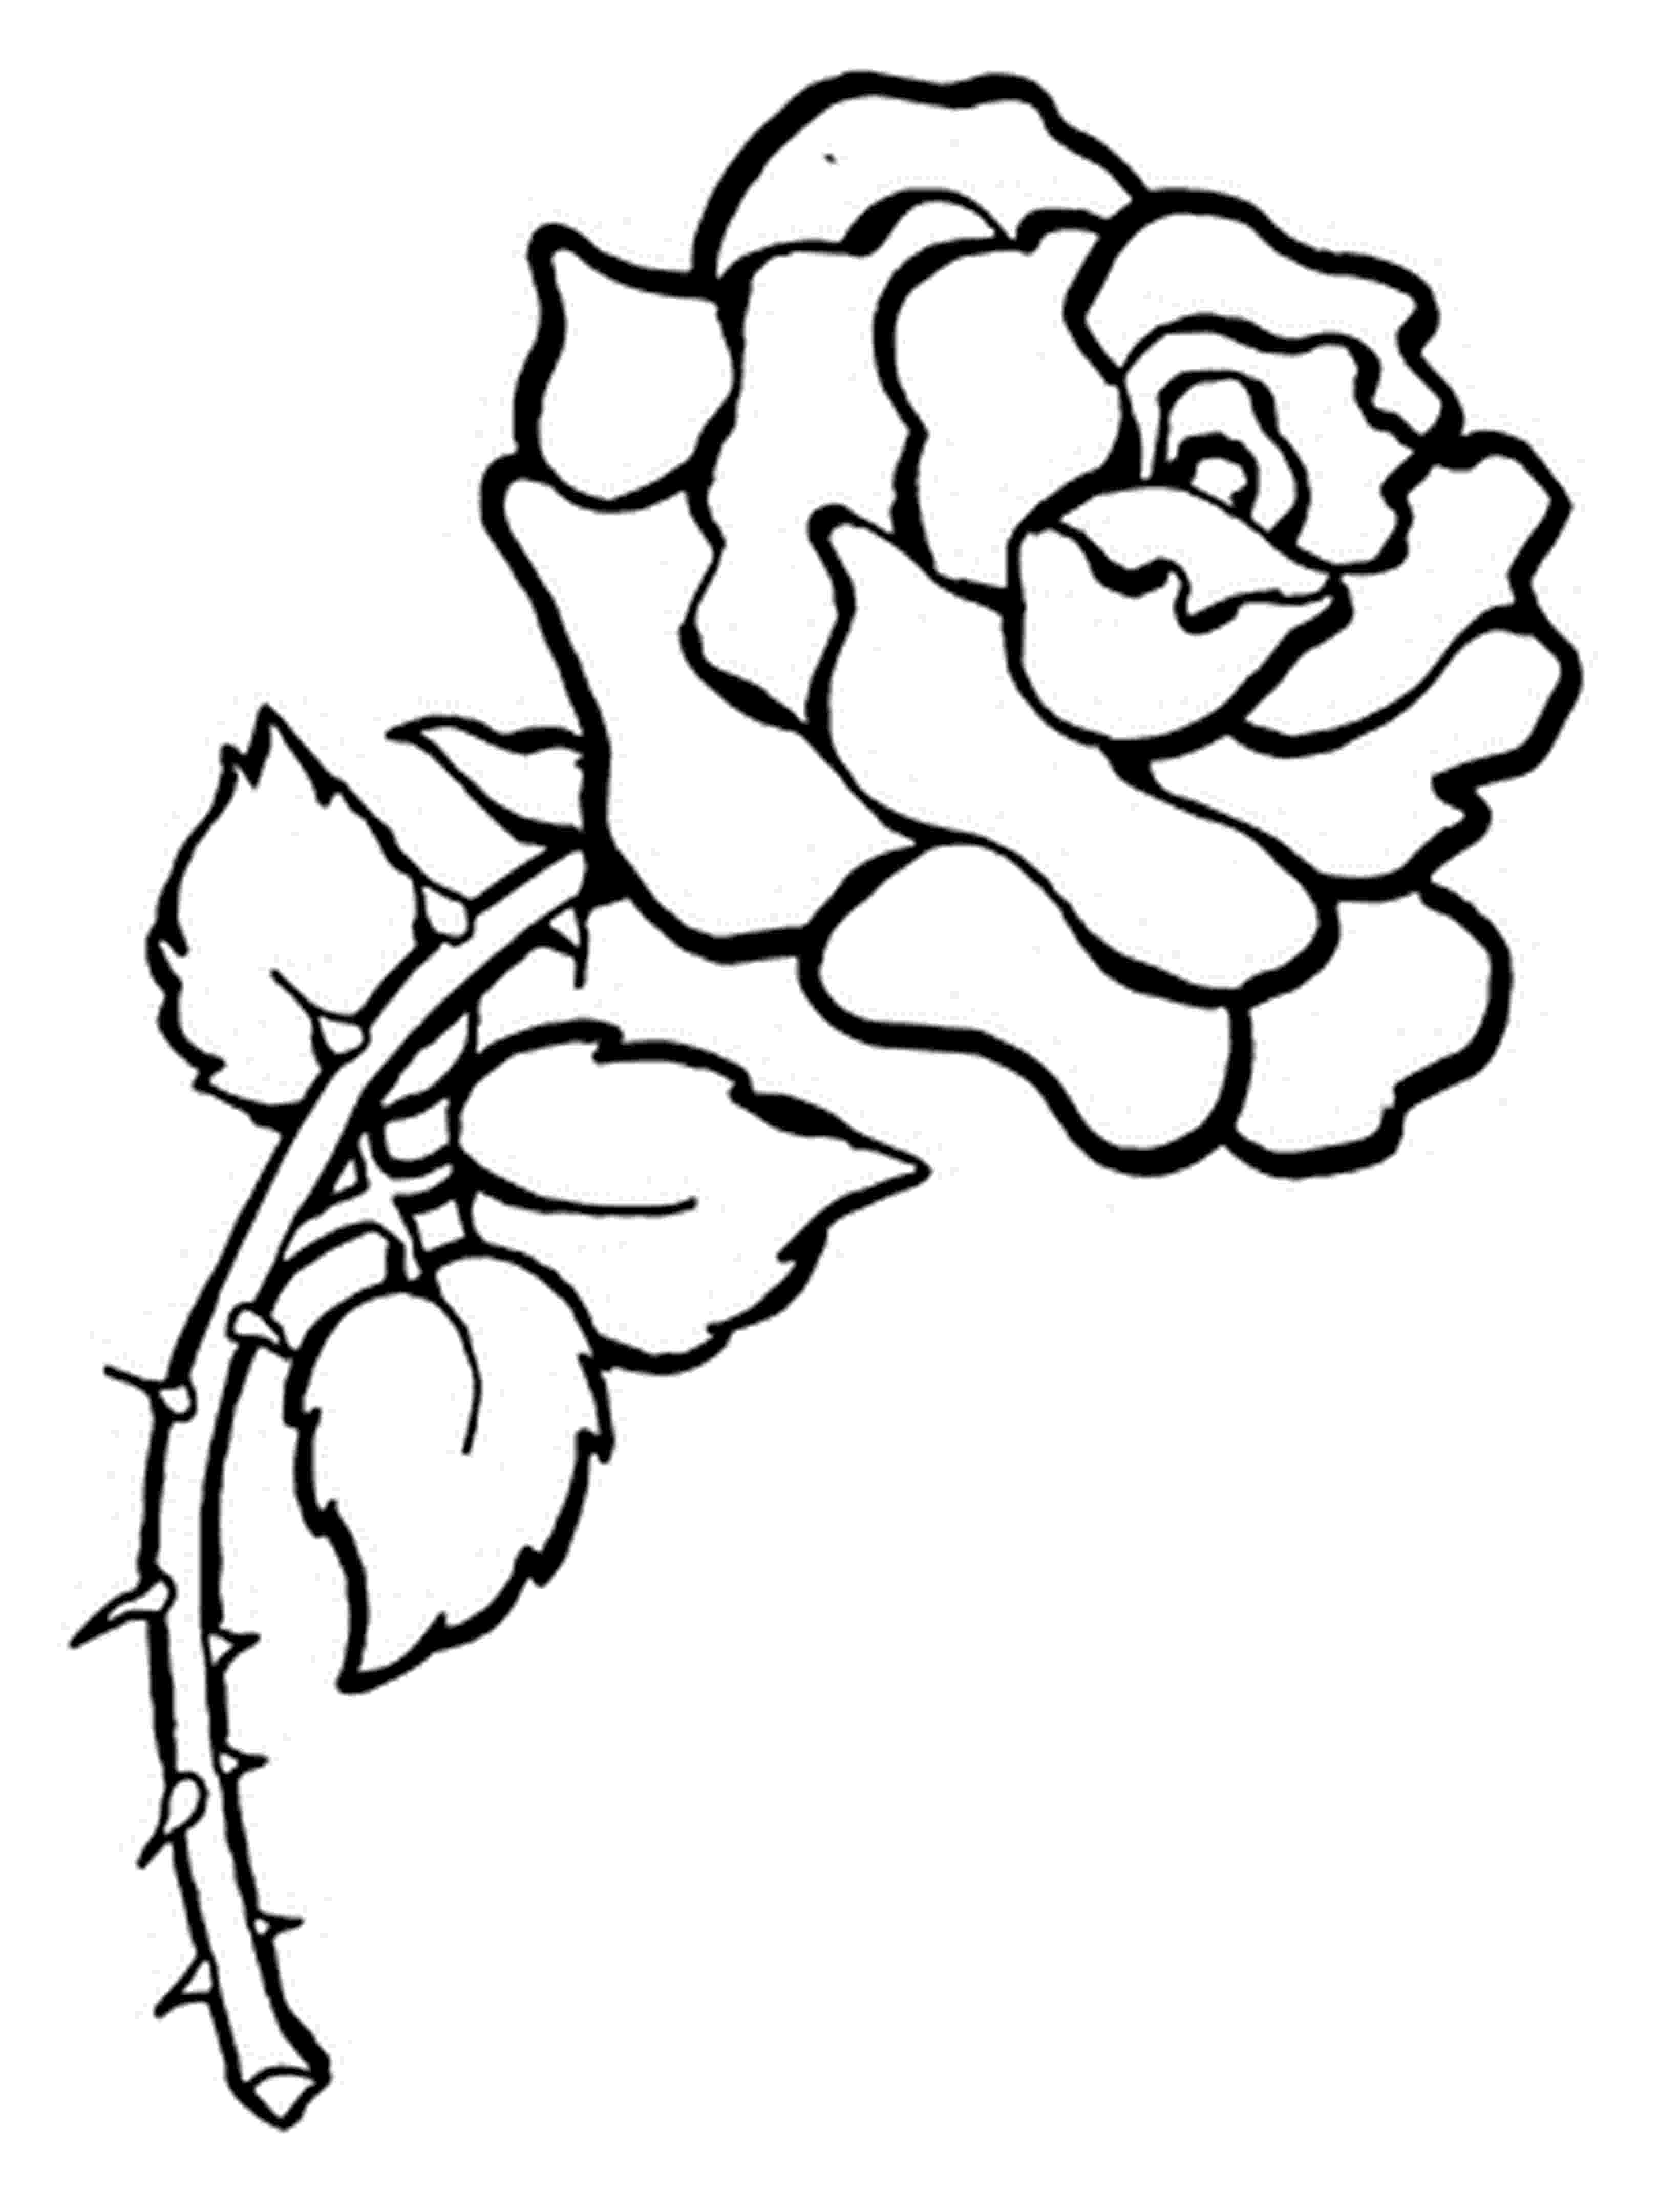 flower printables free printable flower coloring pages for kids best printables flower 1 2